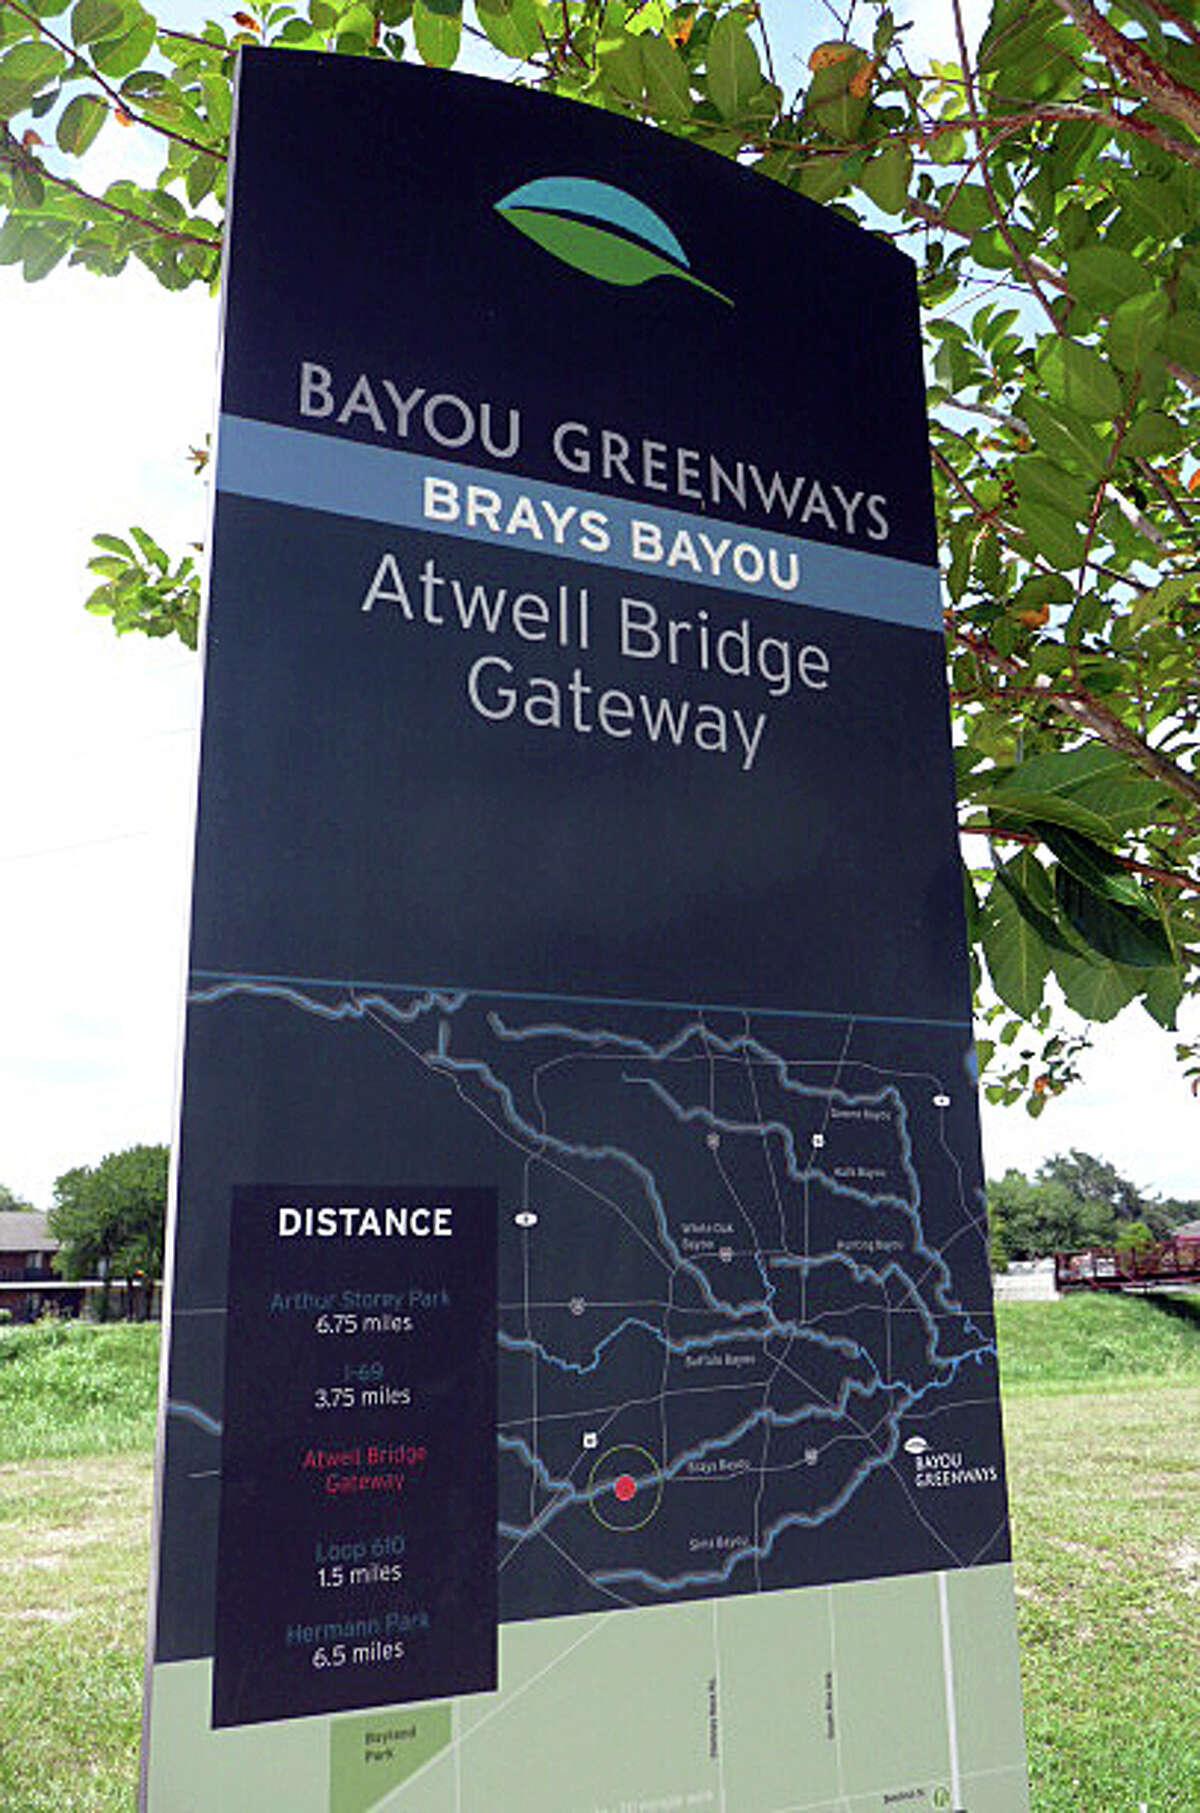 Some of the new Bayou Greenways signage along Brays Bayou Greenway.